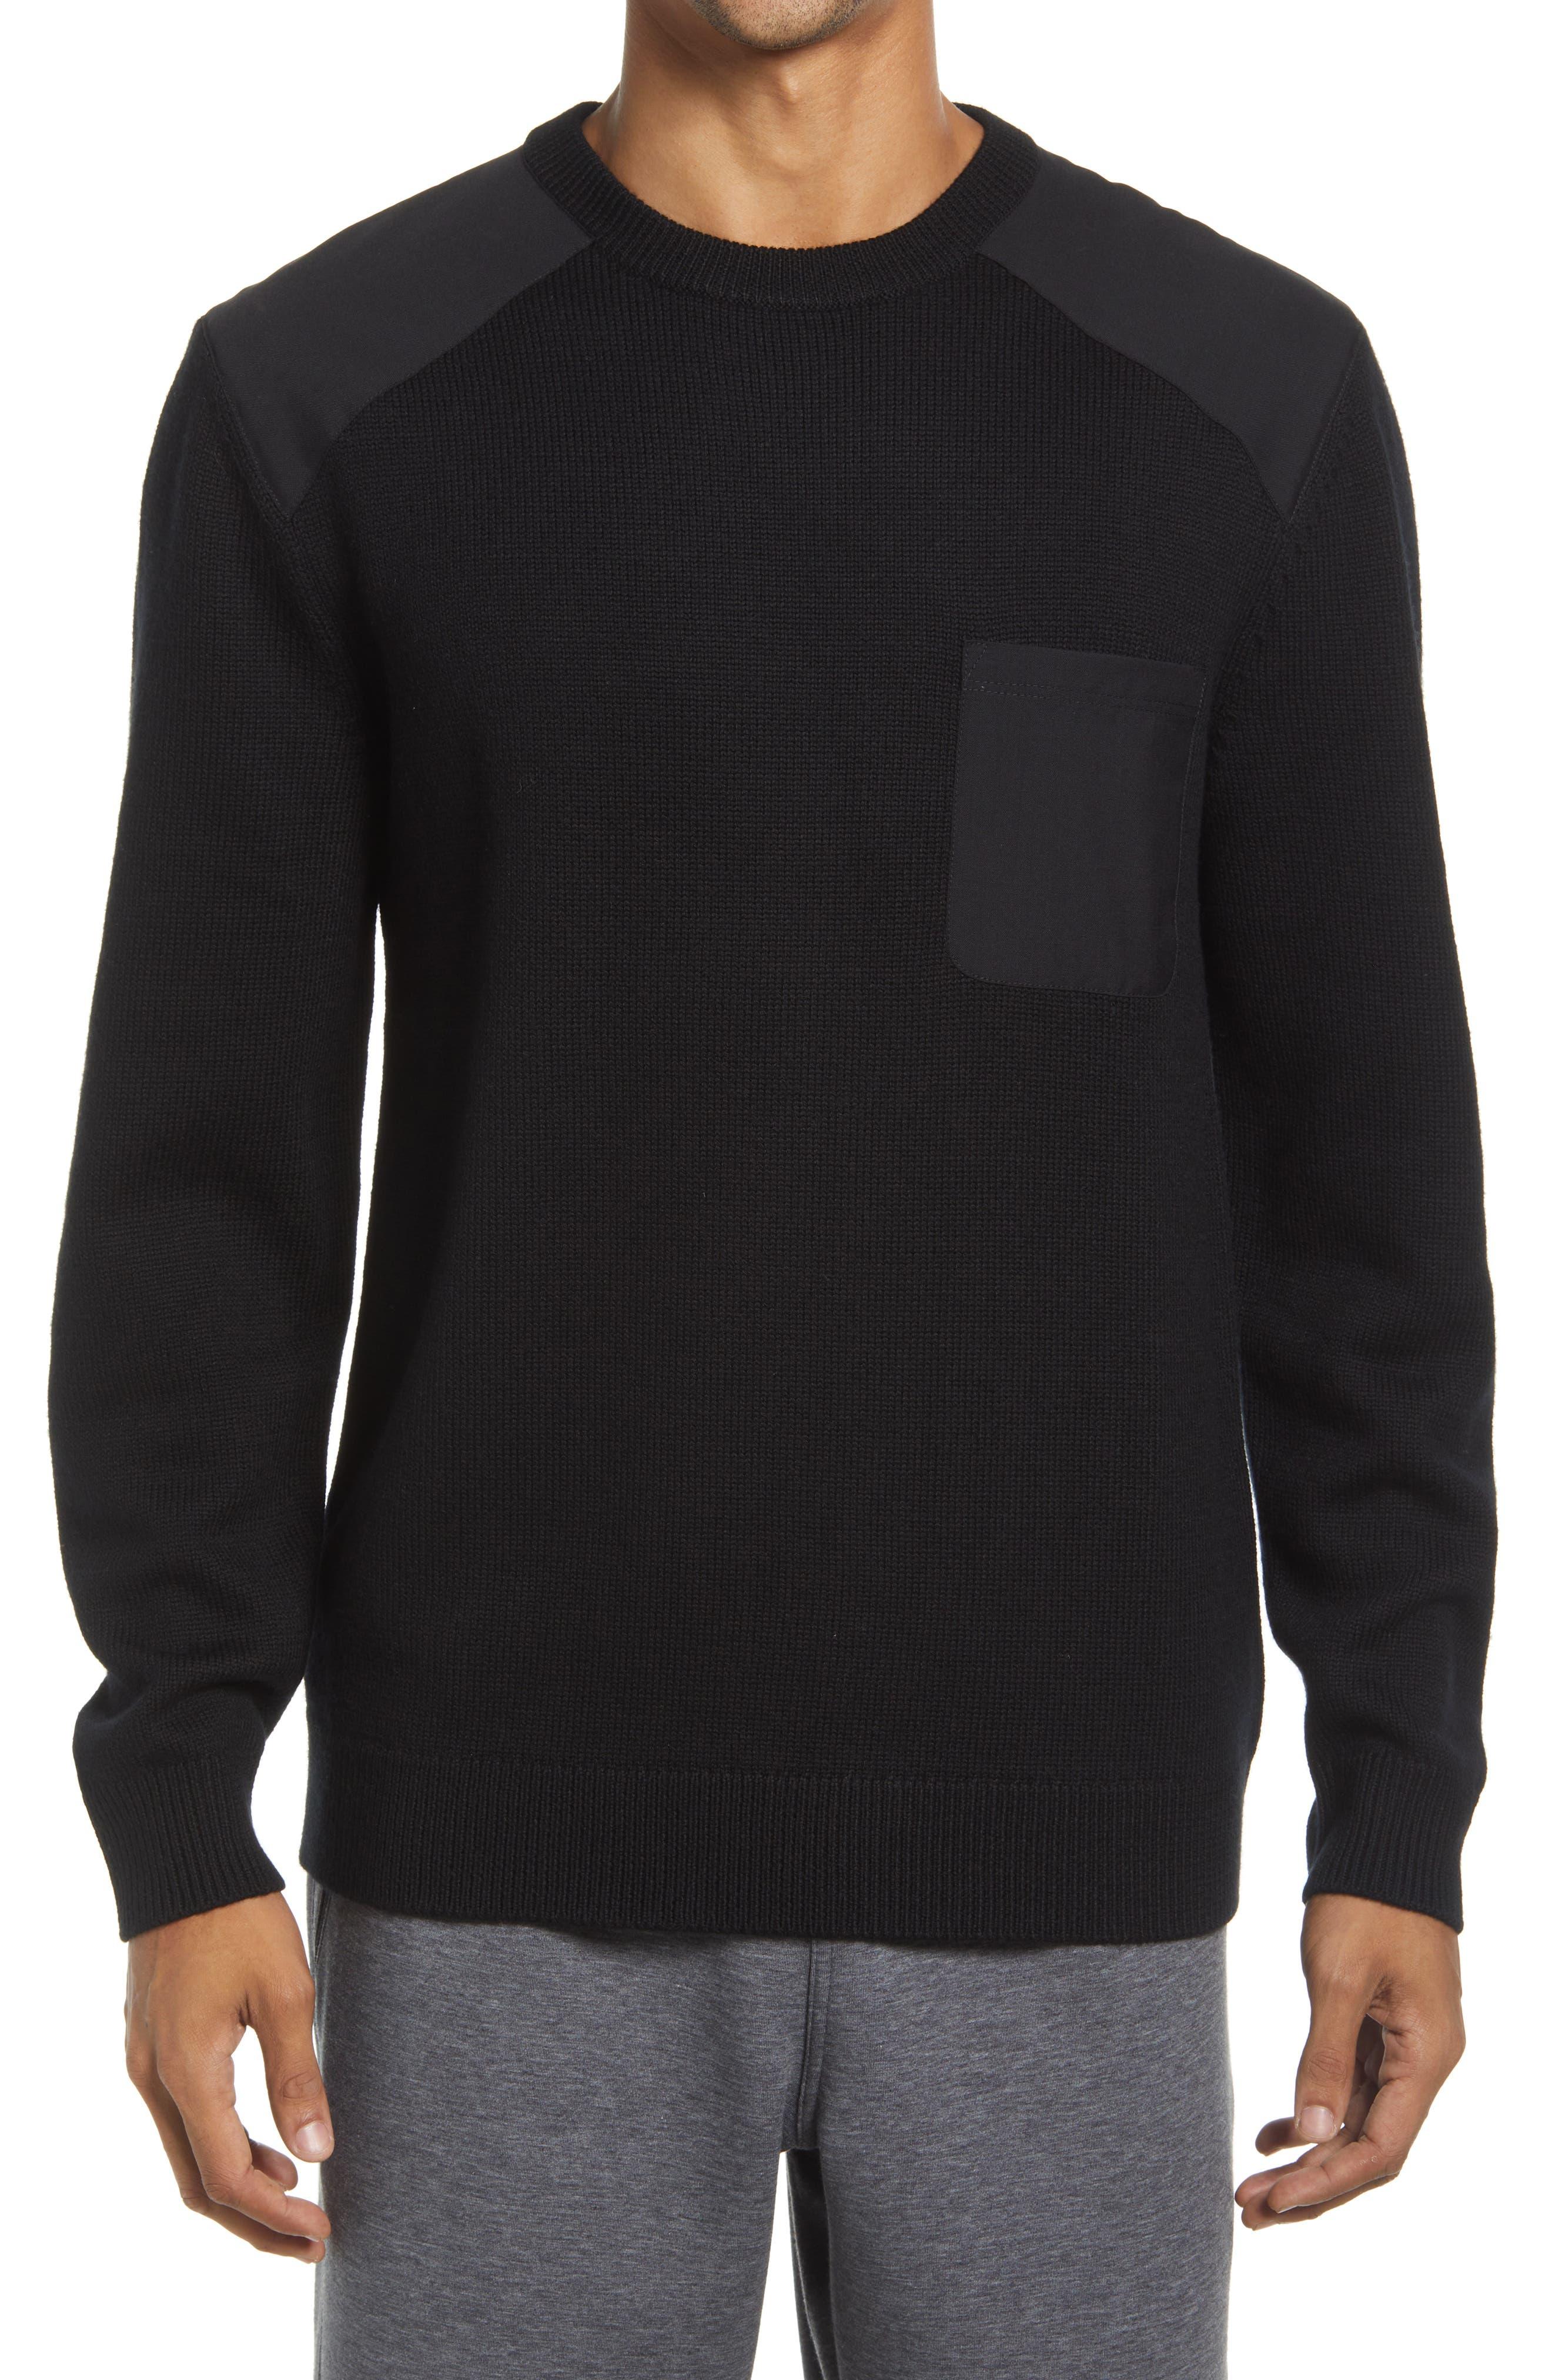 Barein Long Sleeve Crewneck Sweater